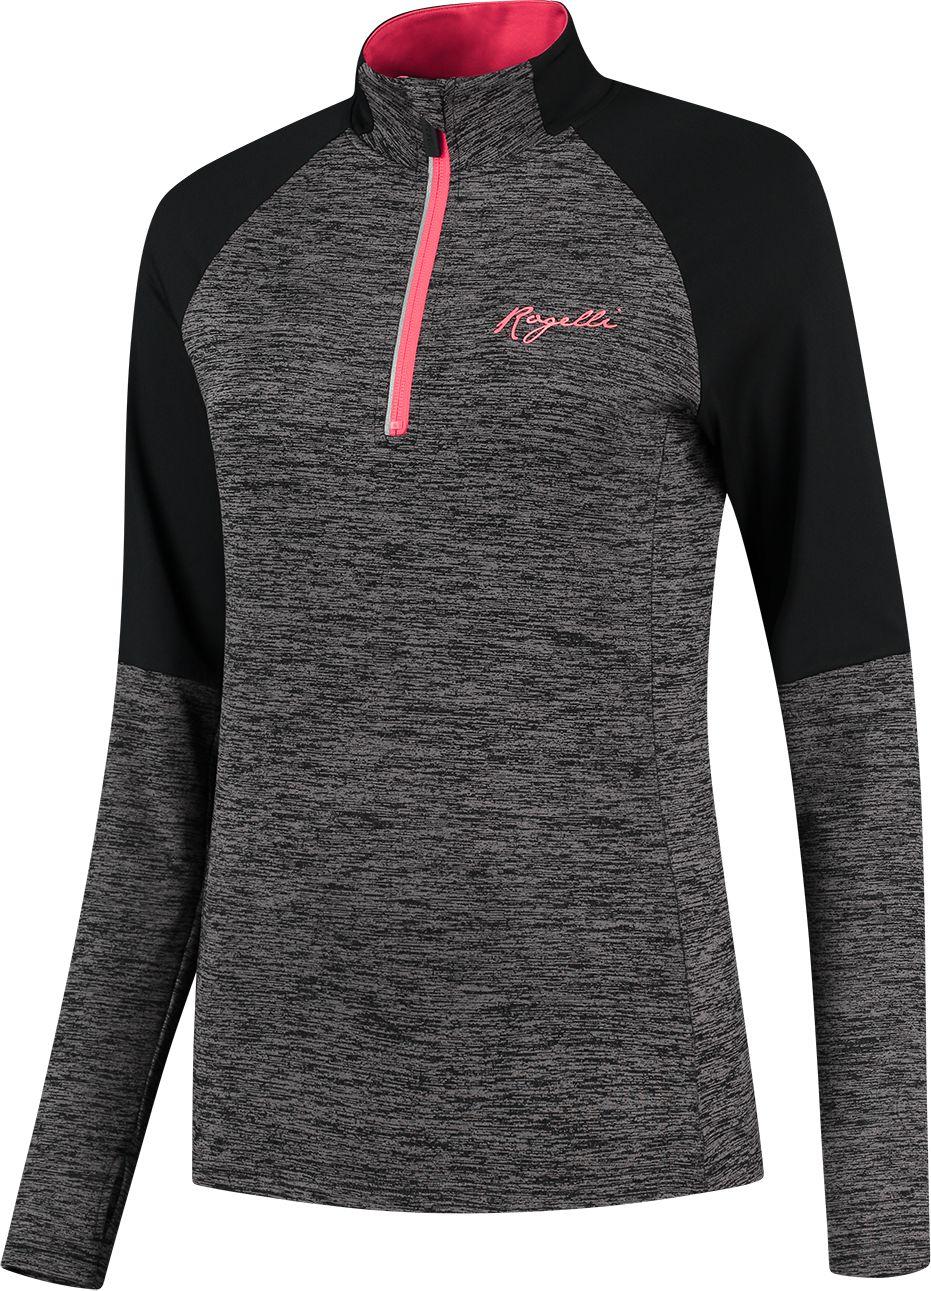 ROGELLI bluza do biegania damska ENJOY grey ROG351109 Rozmiar: L,ROG351109.XS